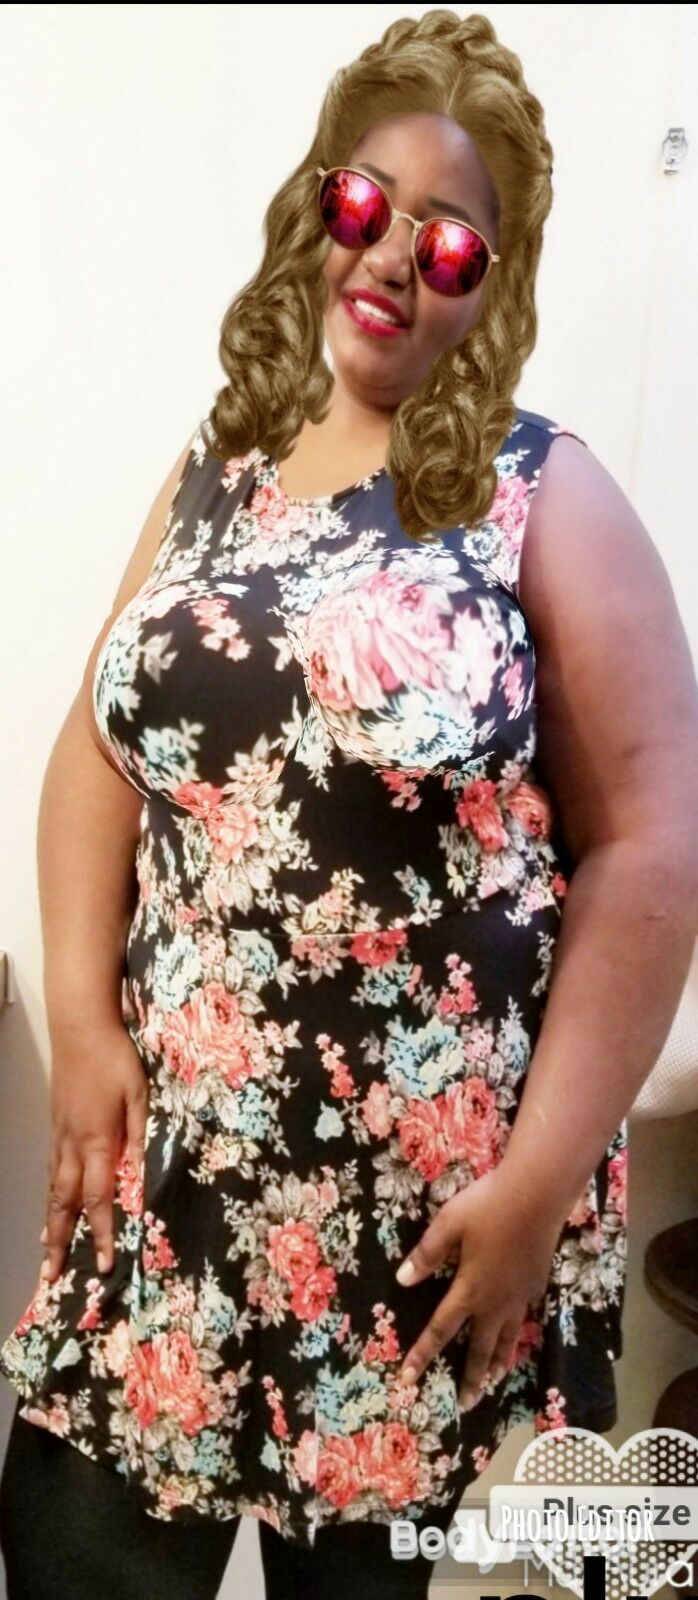 Plus Size Swim dresses and pants for   Women (XL,2XL,3XL and 4XL)  Curvey women